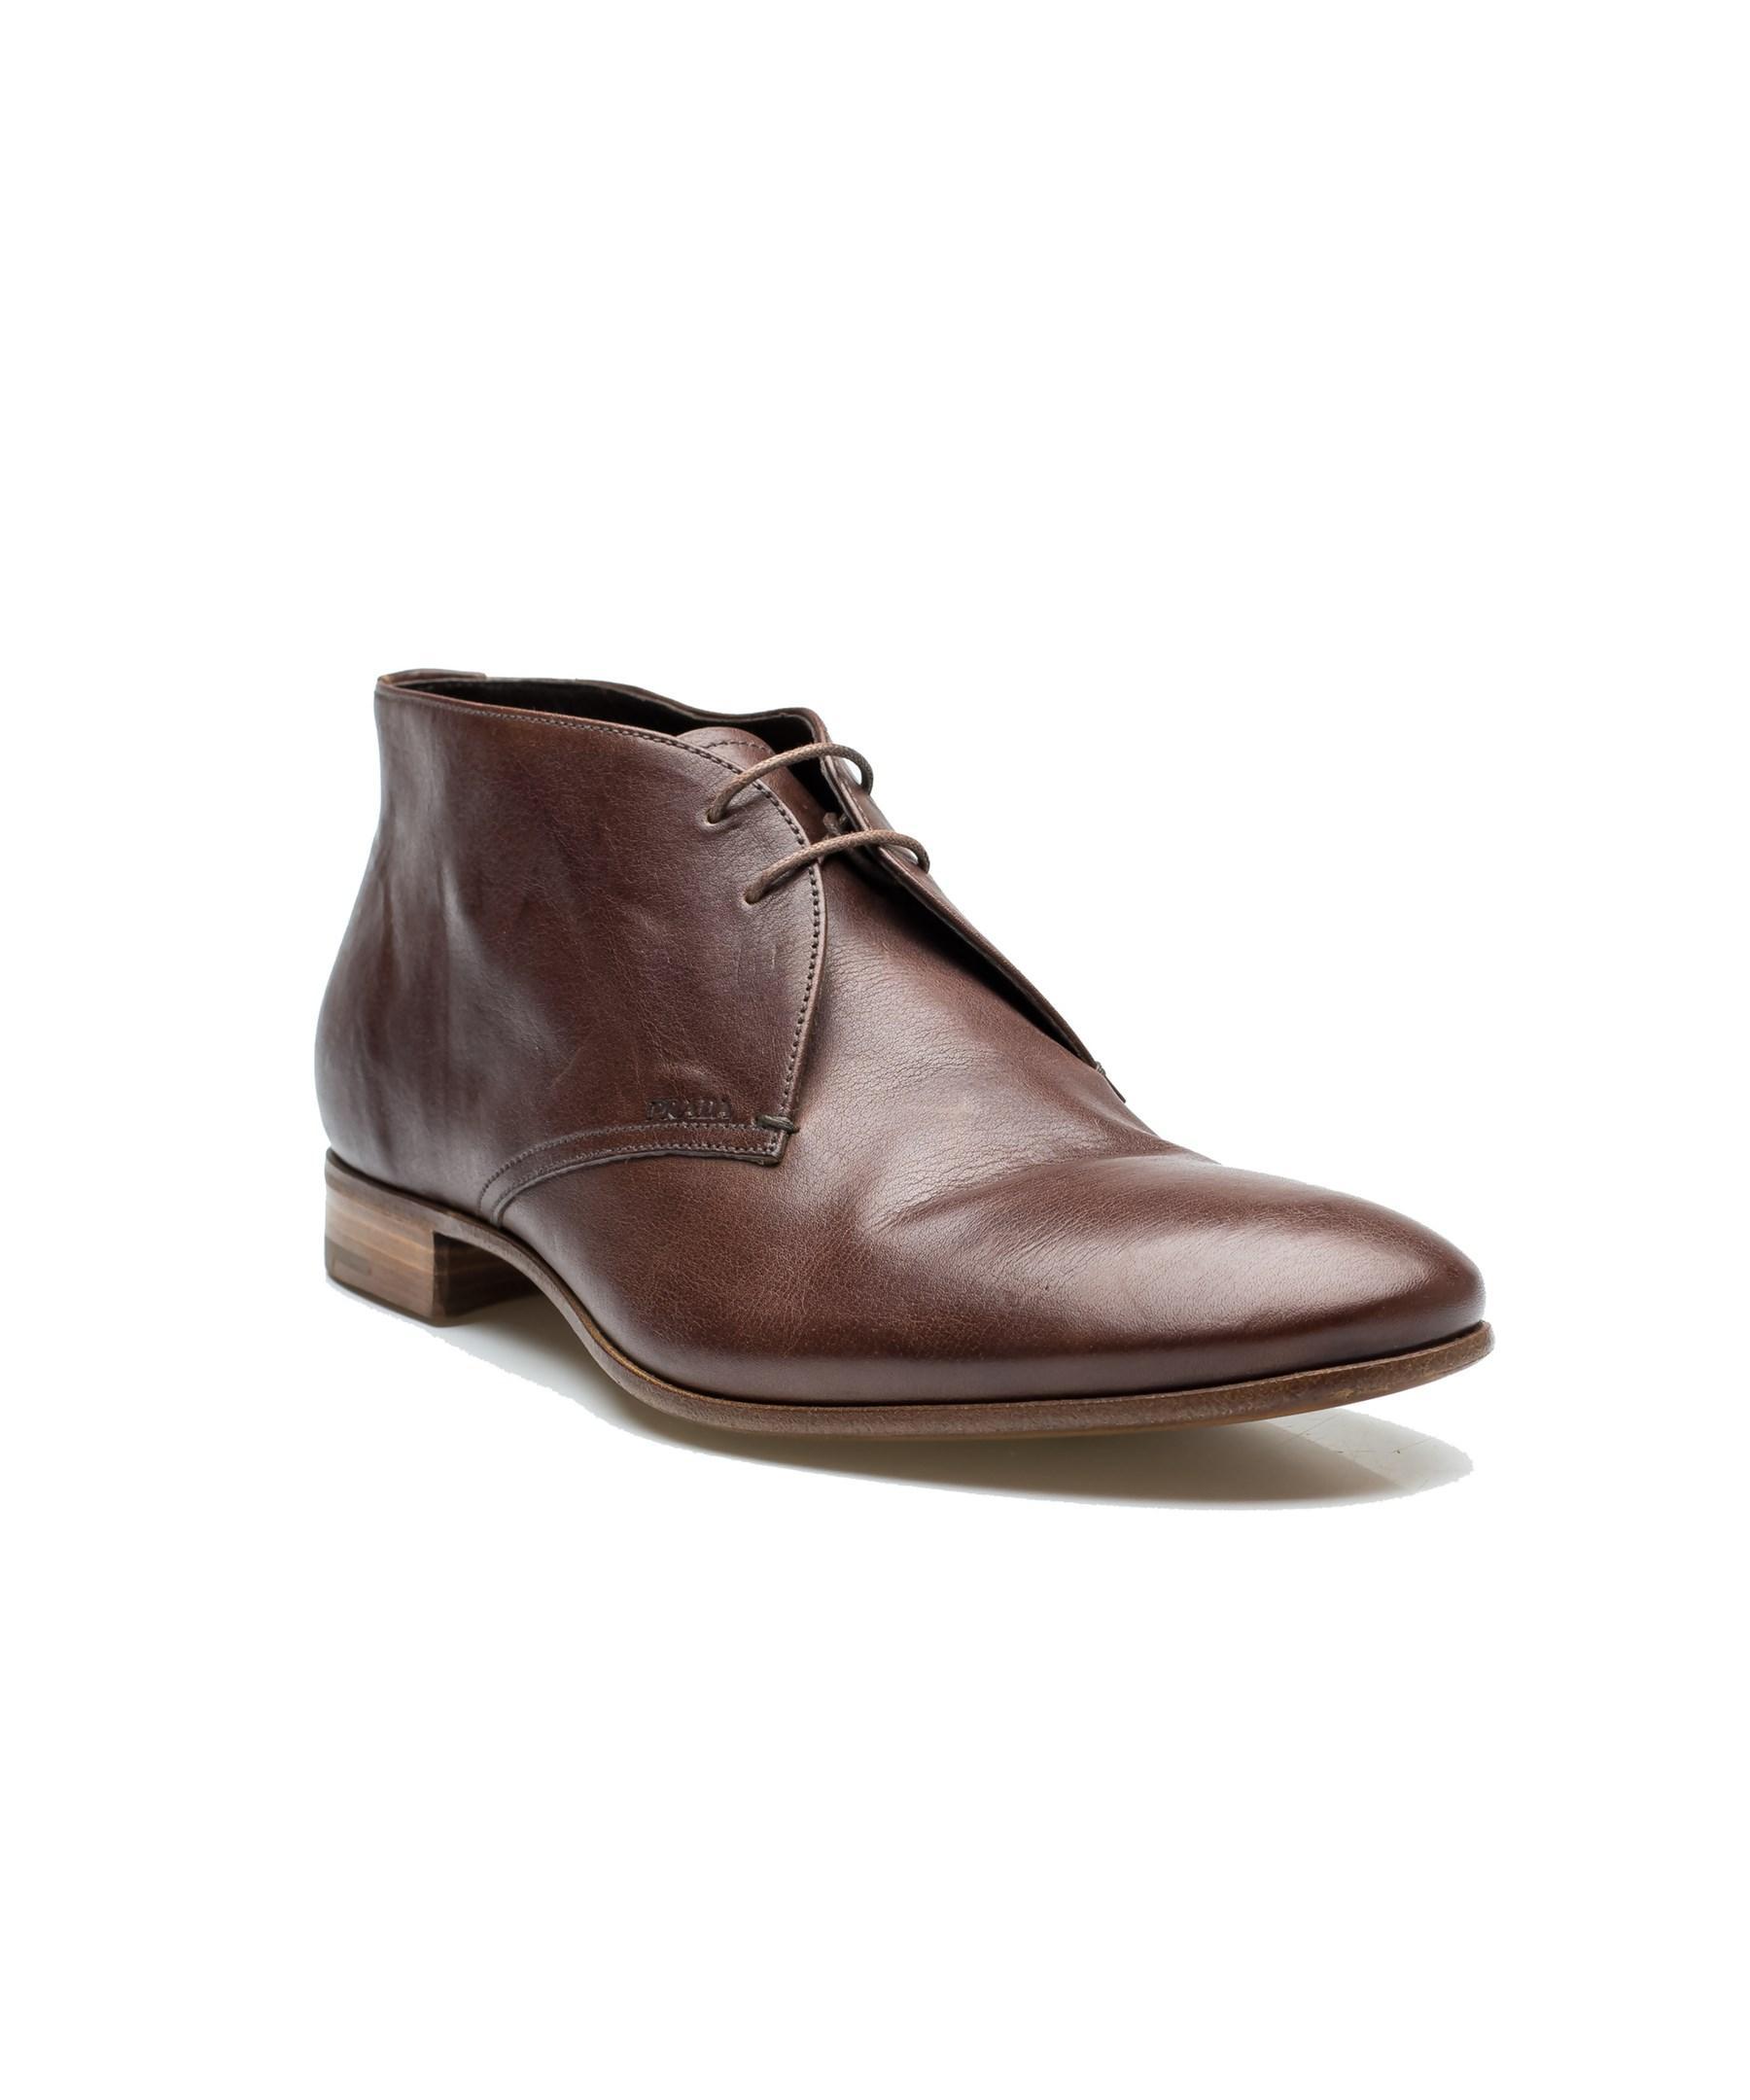 prada mens oxford chukka dress shoes boot leather cocco